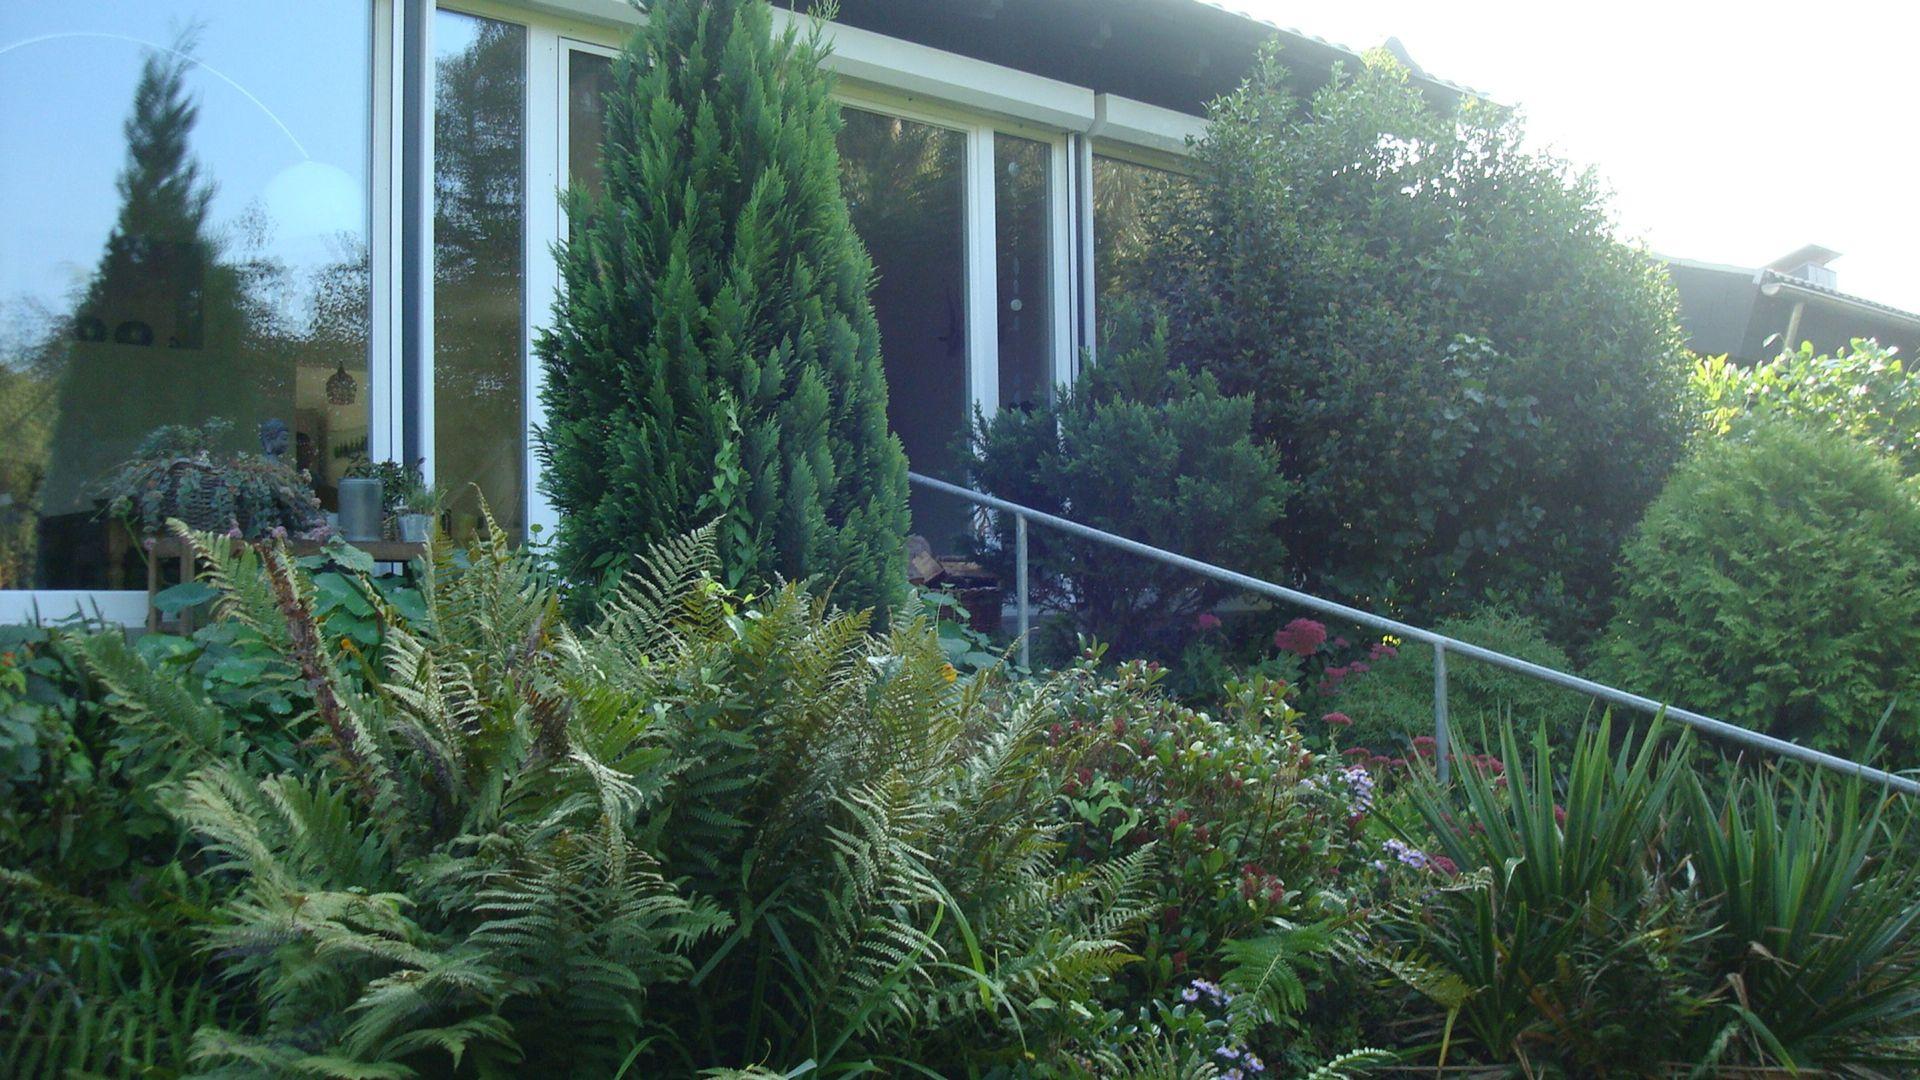 066--Balkon-Gelaender-Montage.JPG